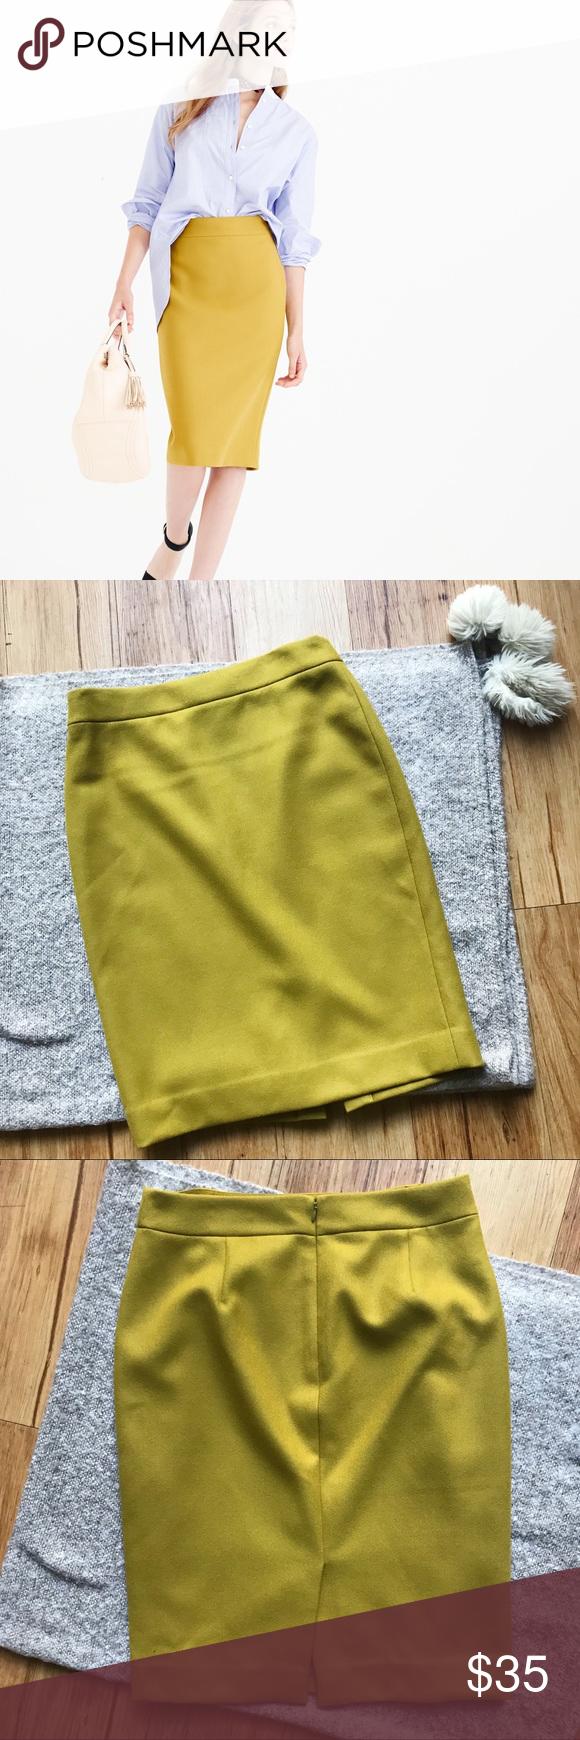 c3802021d J.Crew No.2 Pencil chartreuse yellow wool skirt 10 Classic chartreuse  yellow wool